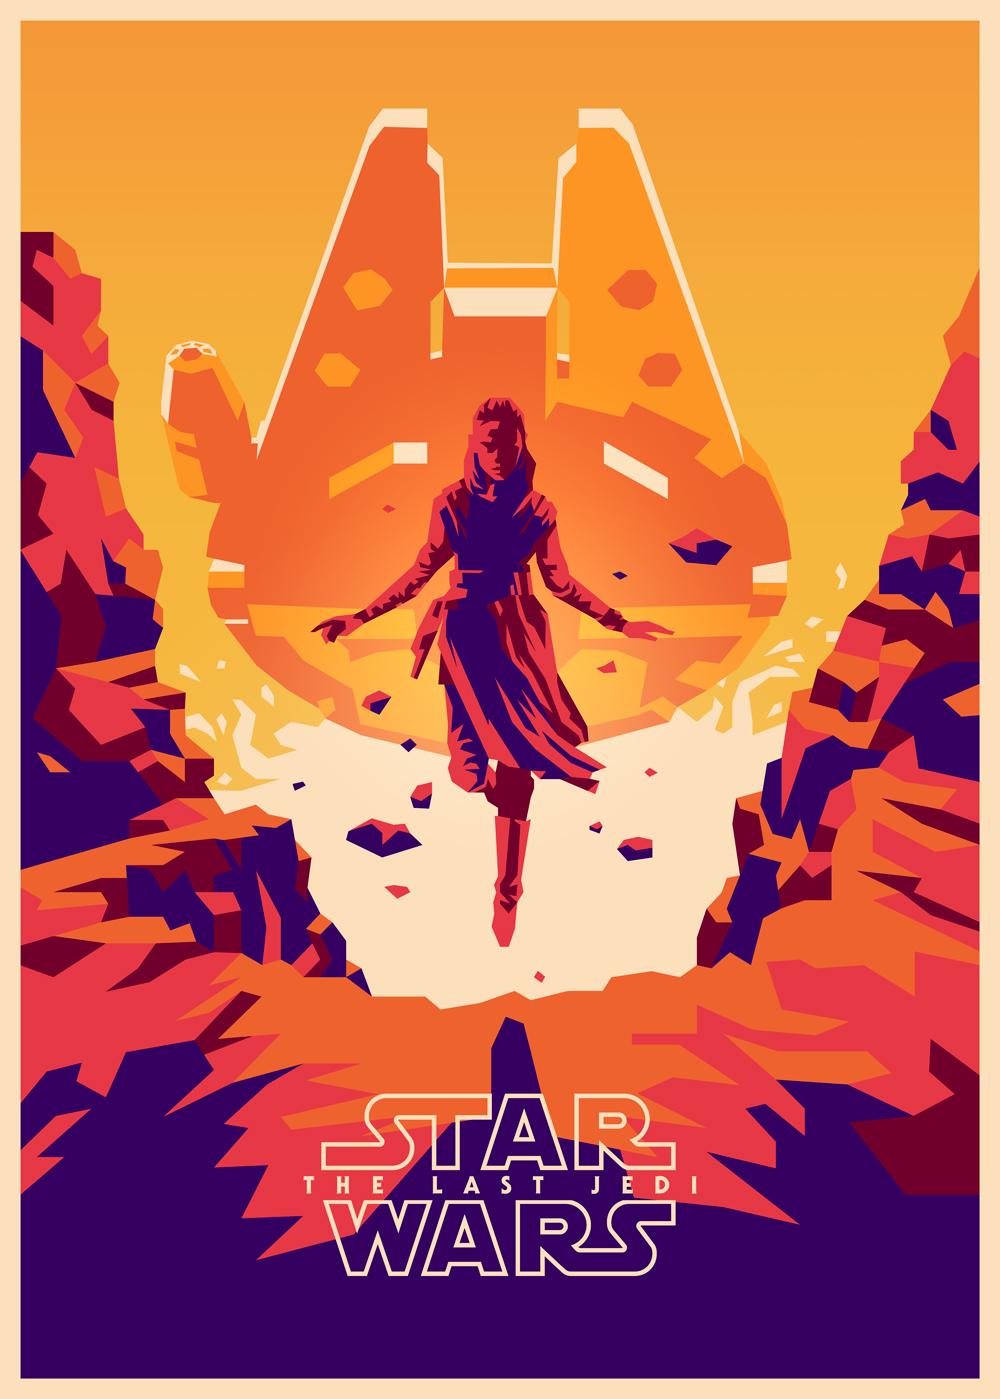 The-Last-Jedi-web.jpg